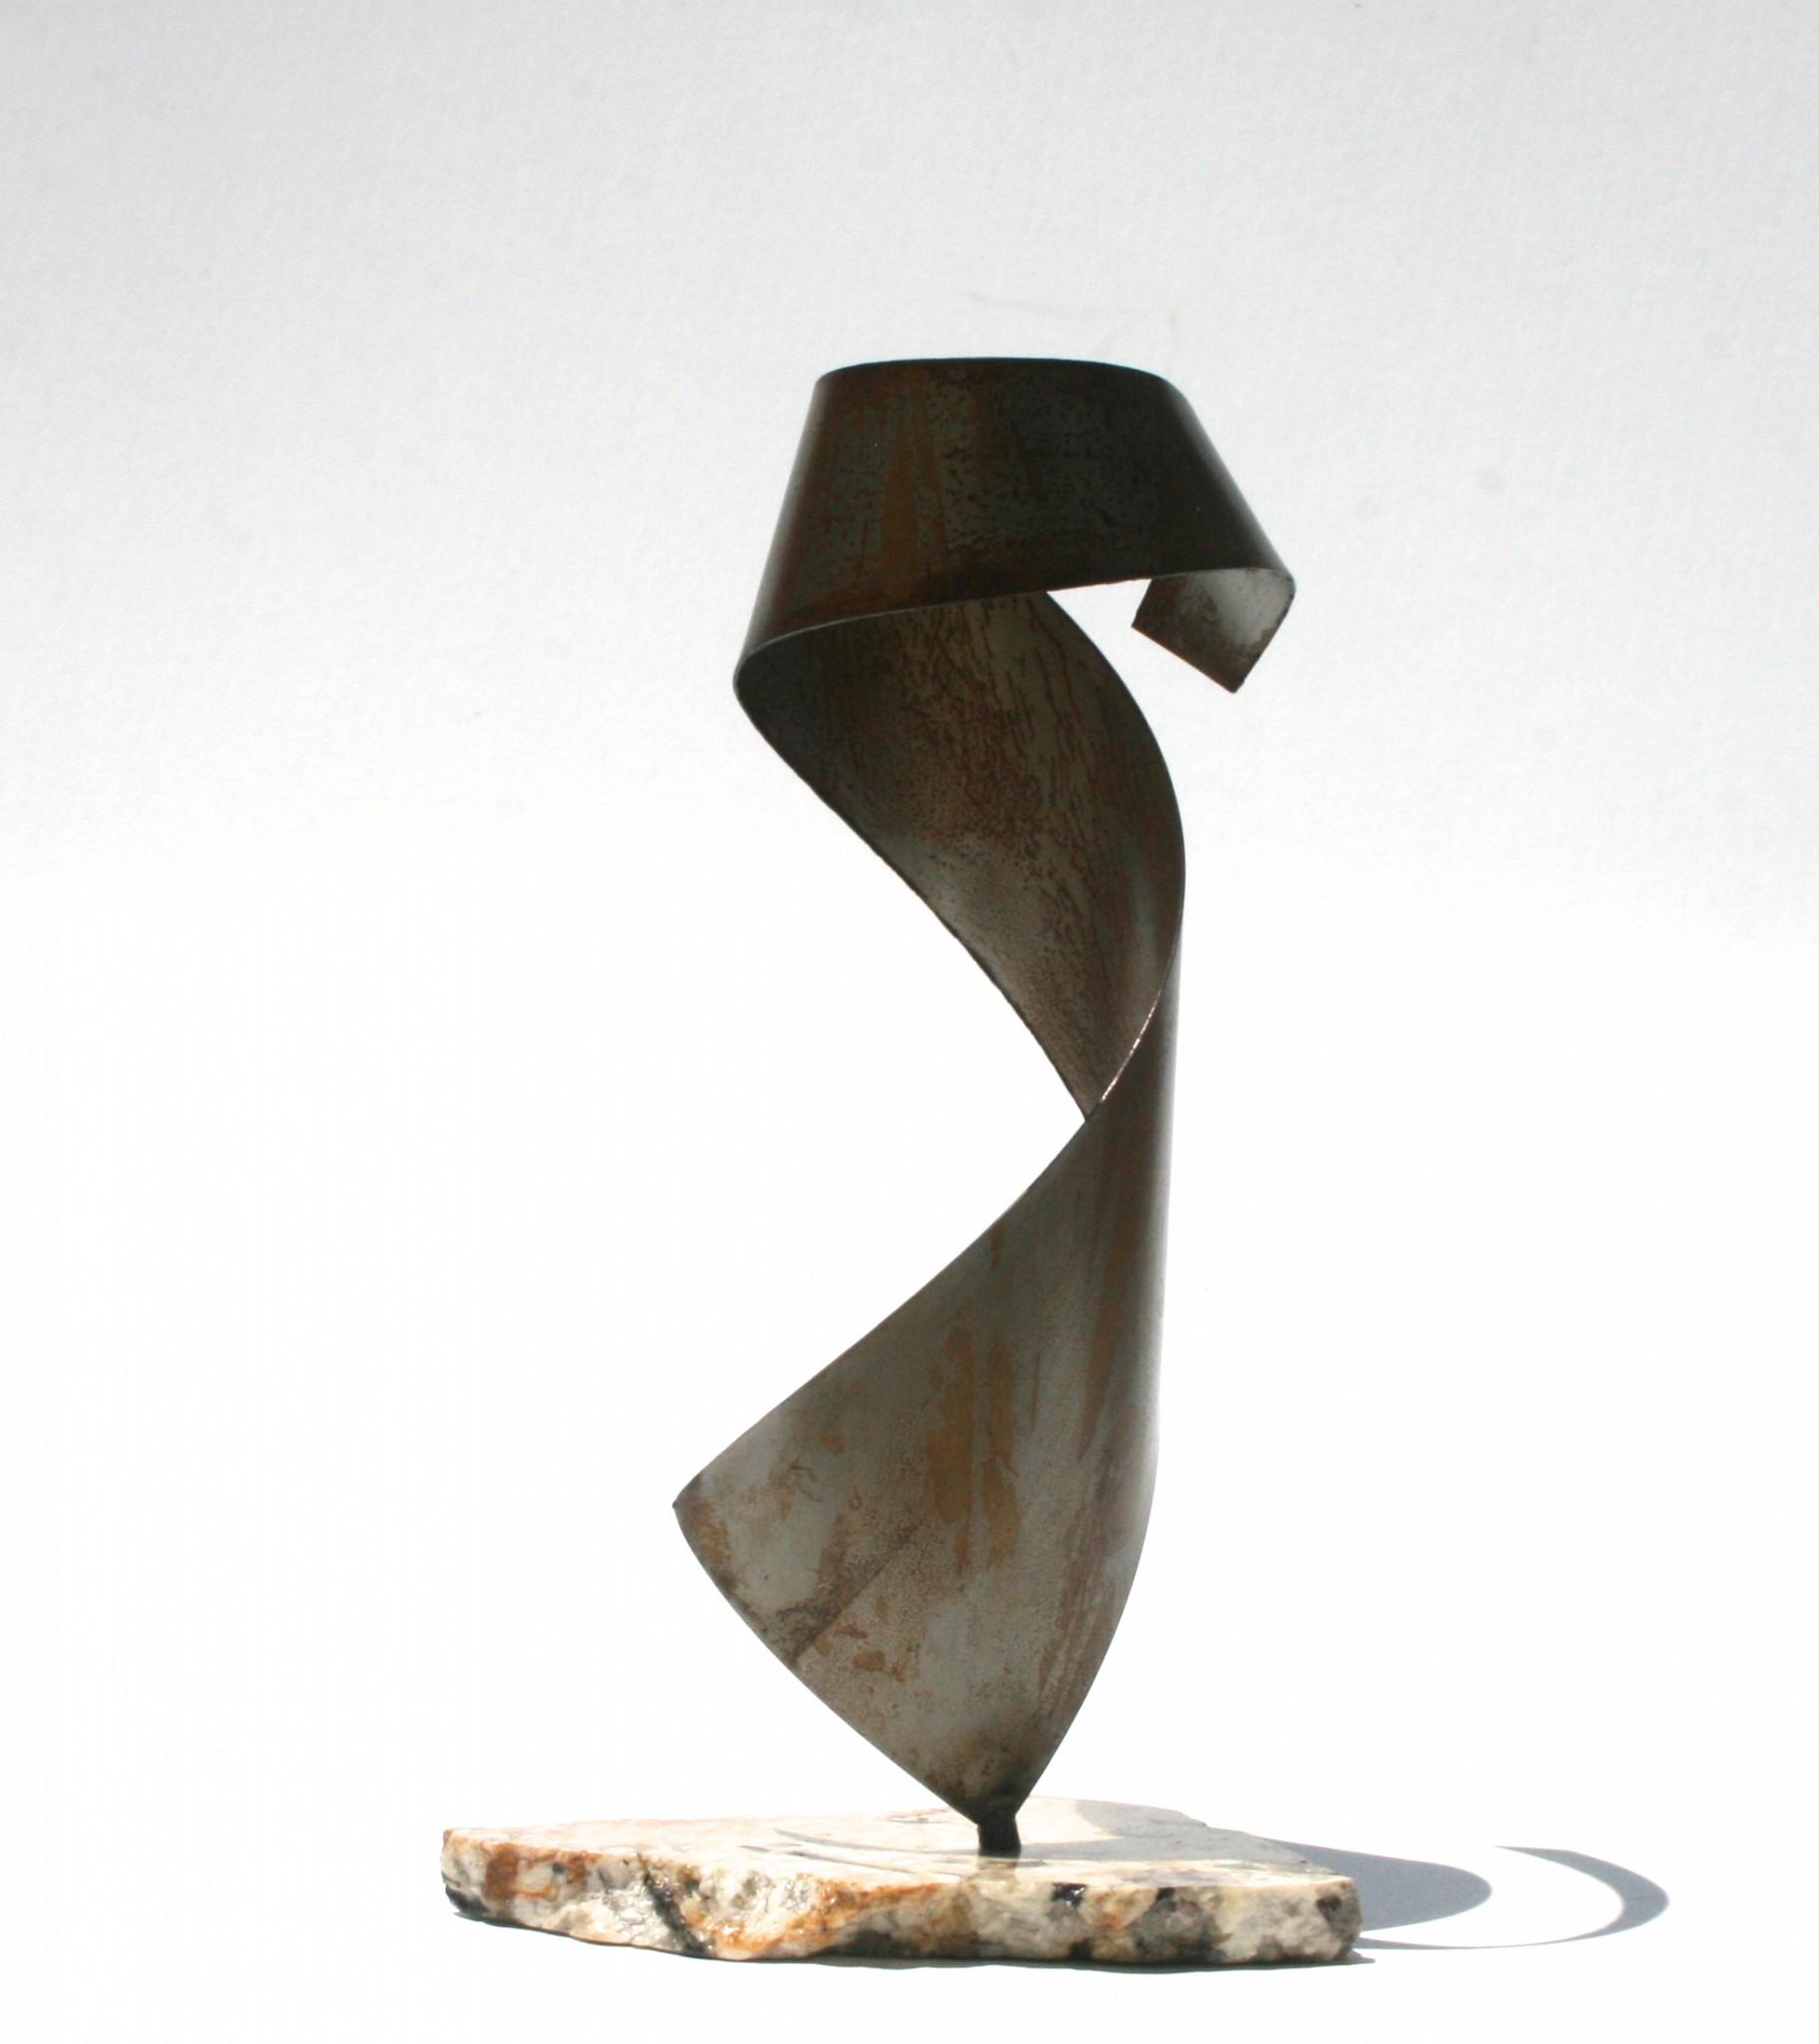 Sierra table top sculpture view 3